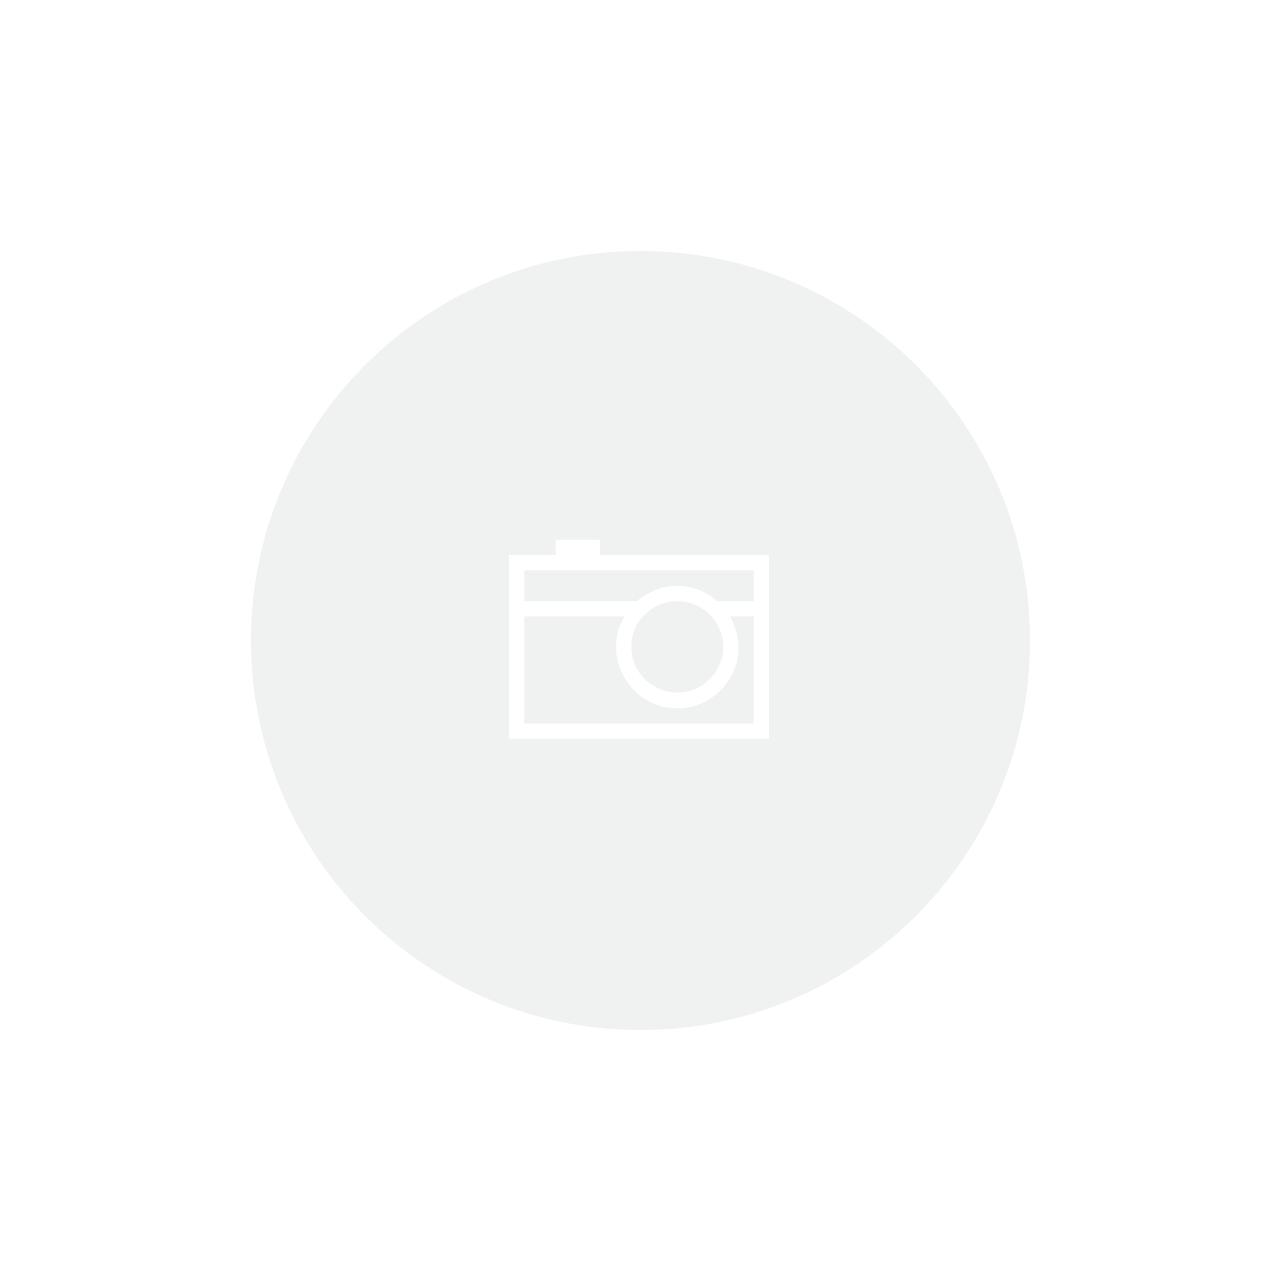 Filtro de ar Inbox BMC Air Filter para Jaguar XF/XJ